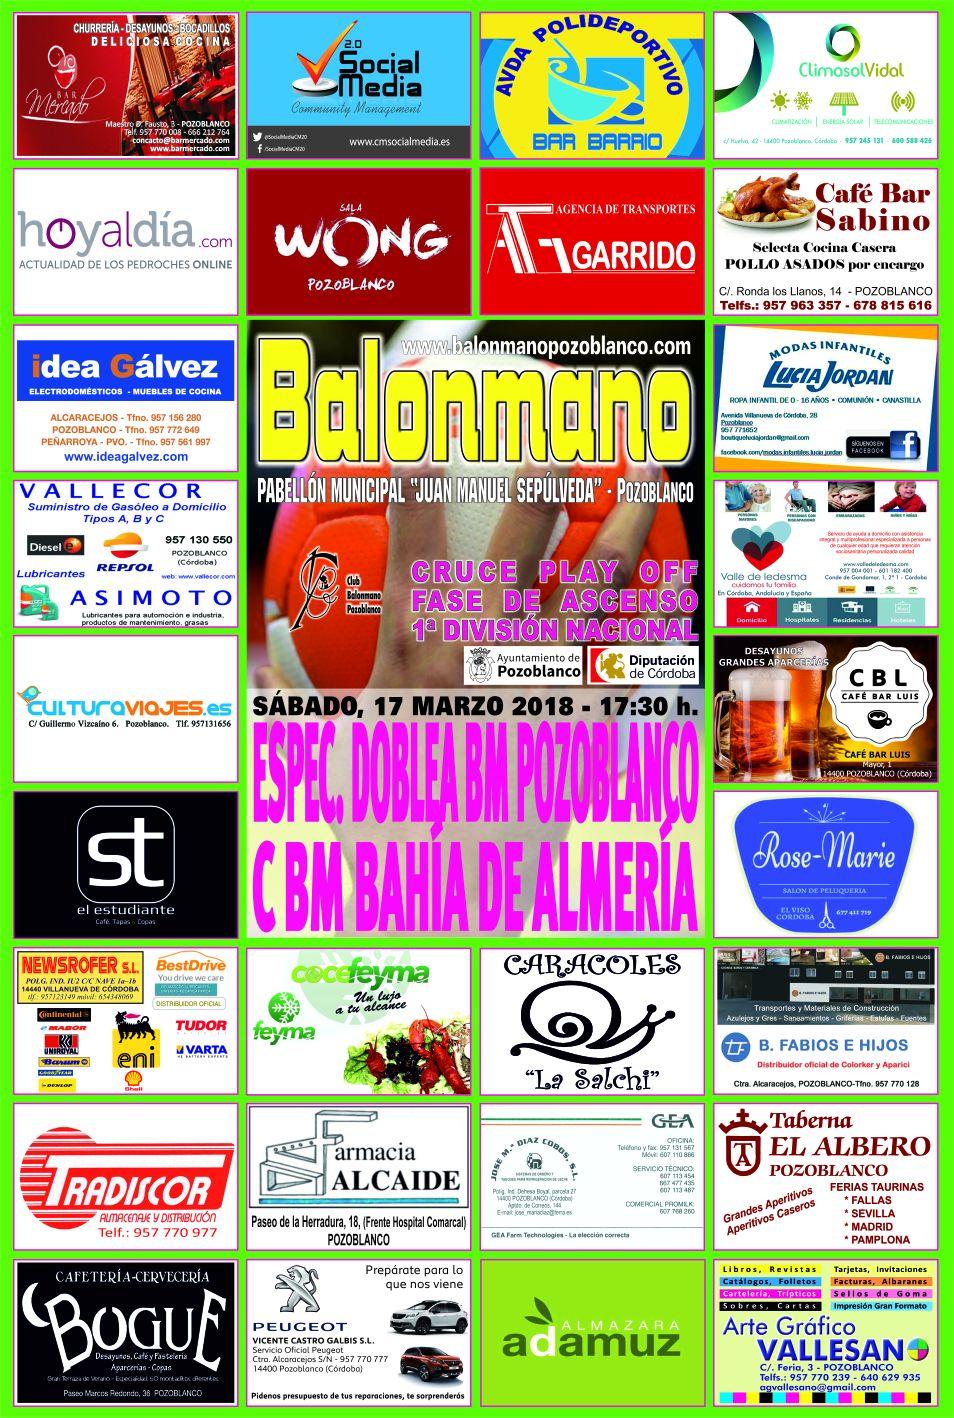 BM Pozoblanco - CBM Bahia de Almeria